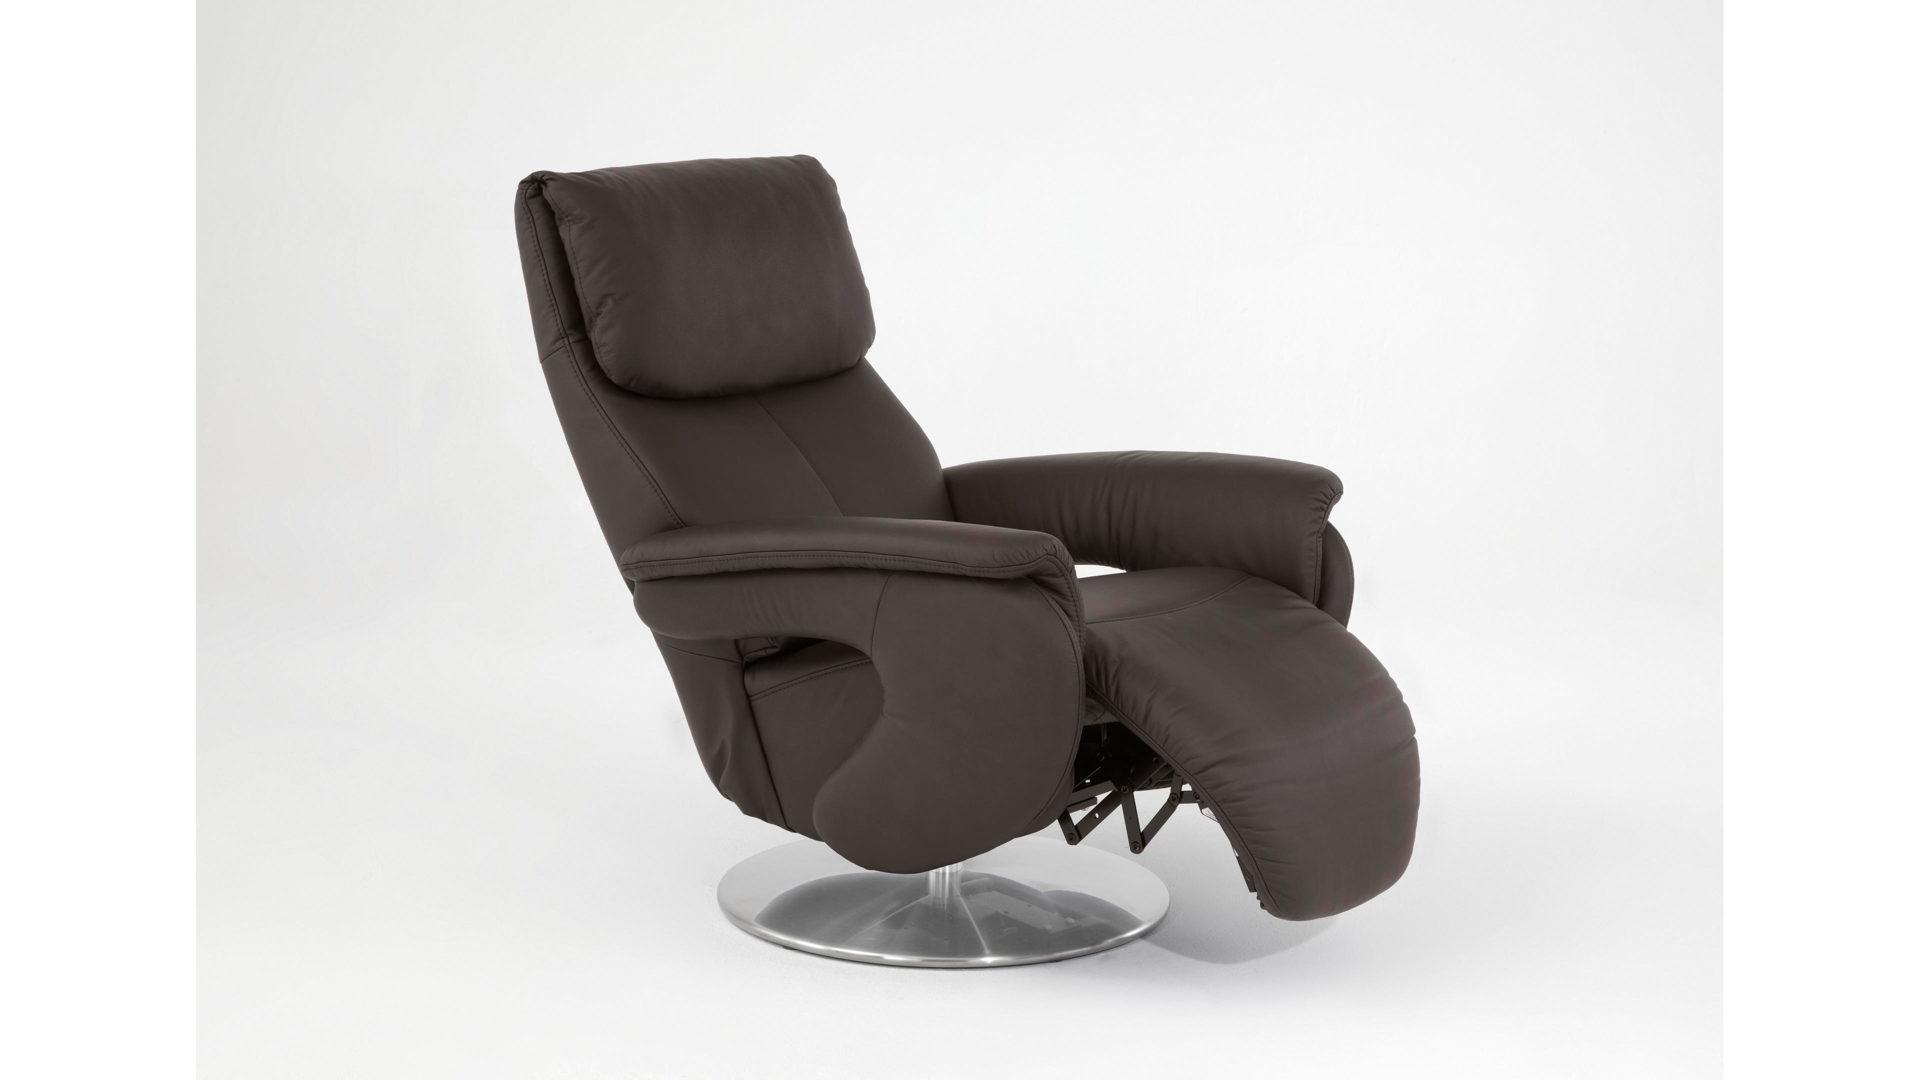 Wohnzimmer Sessel Modern schaukelstuhl modern polster grn ardea carlo mollino Mbel Bernsktter Mlheim Rume Wohnzimmer Sessel Hocker